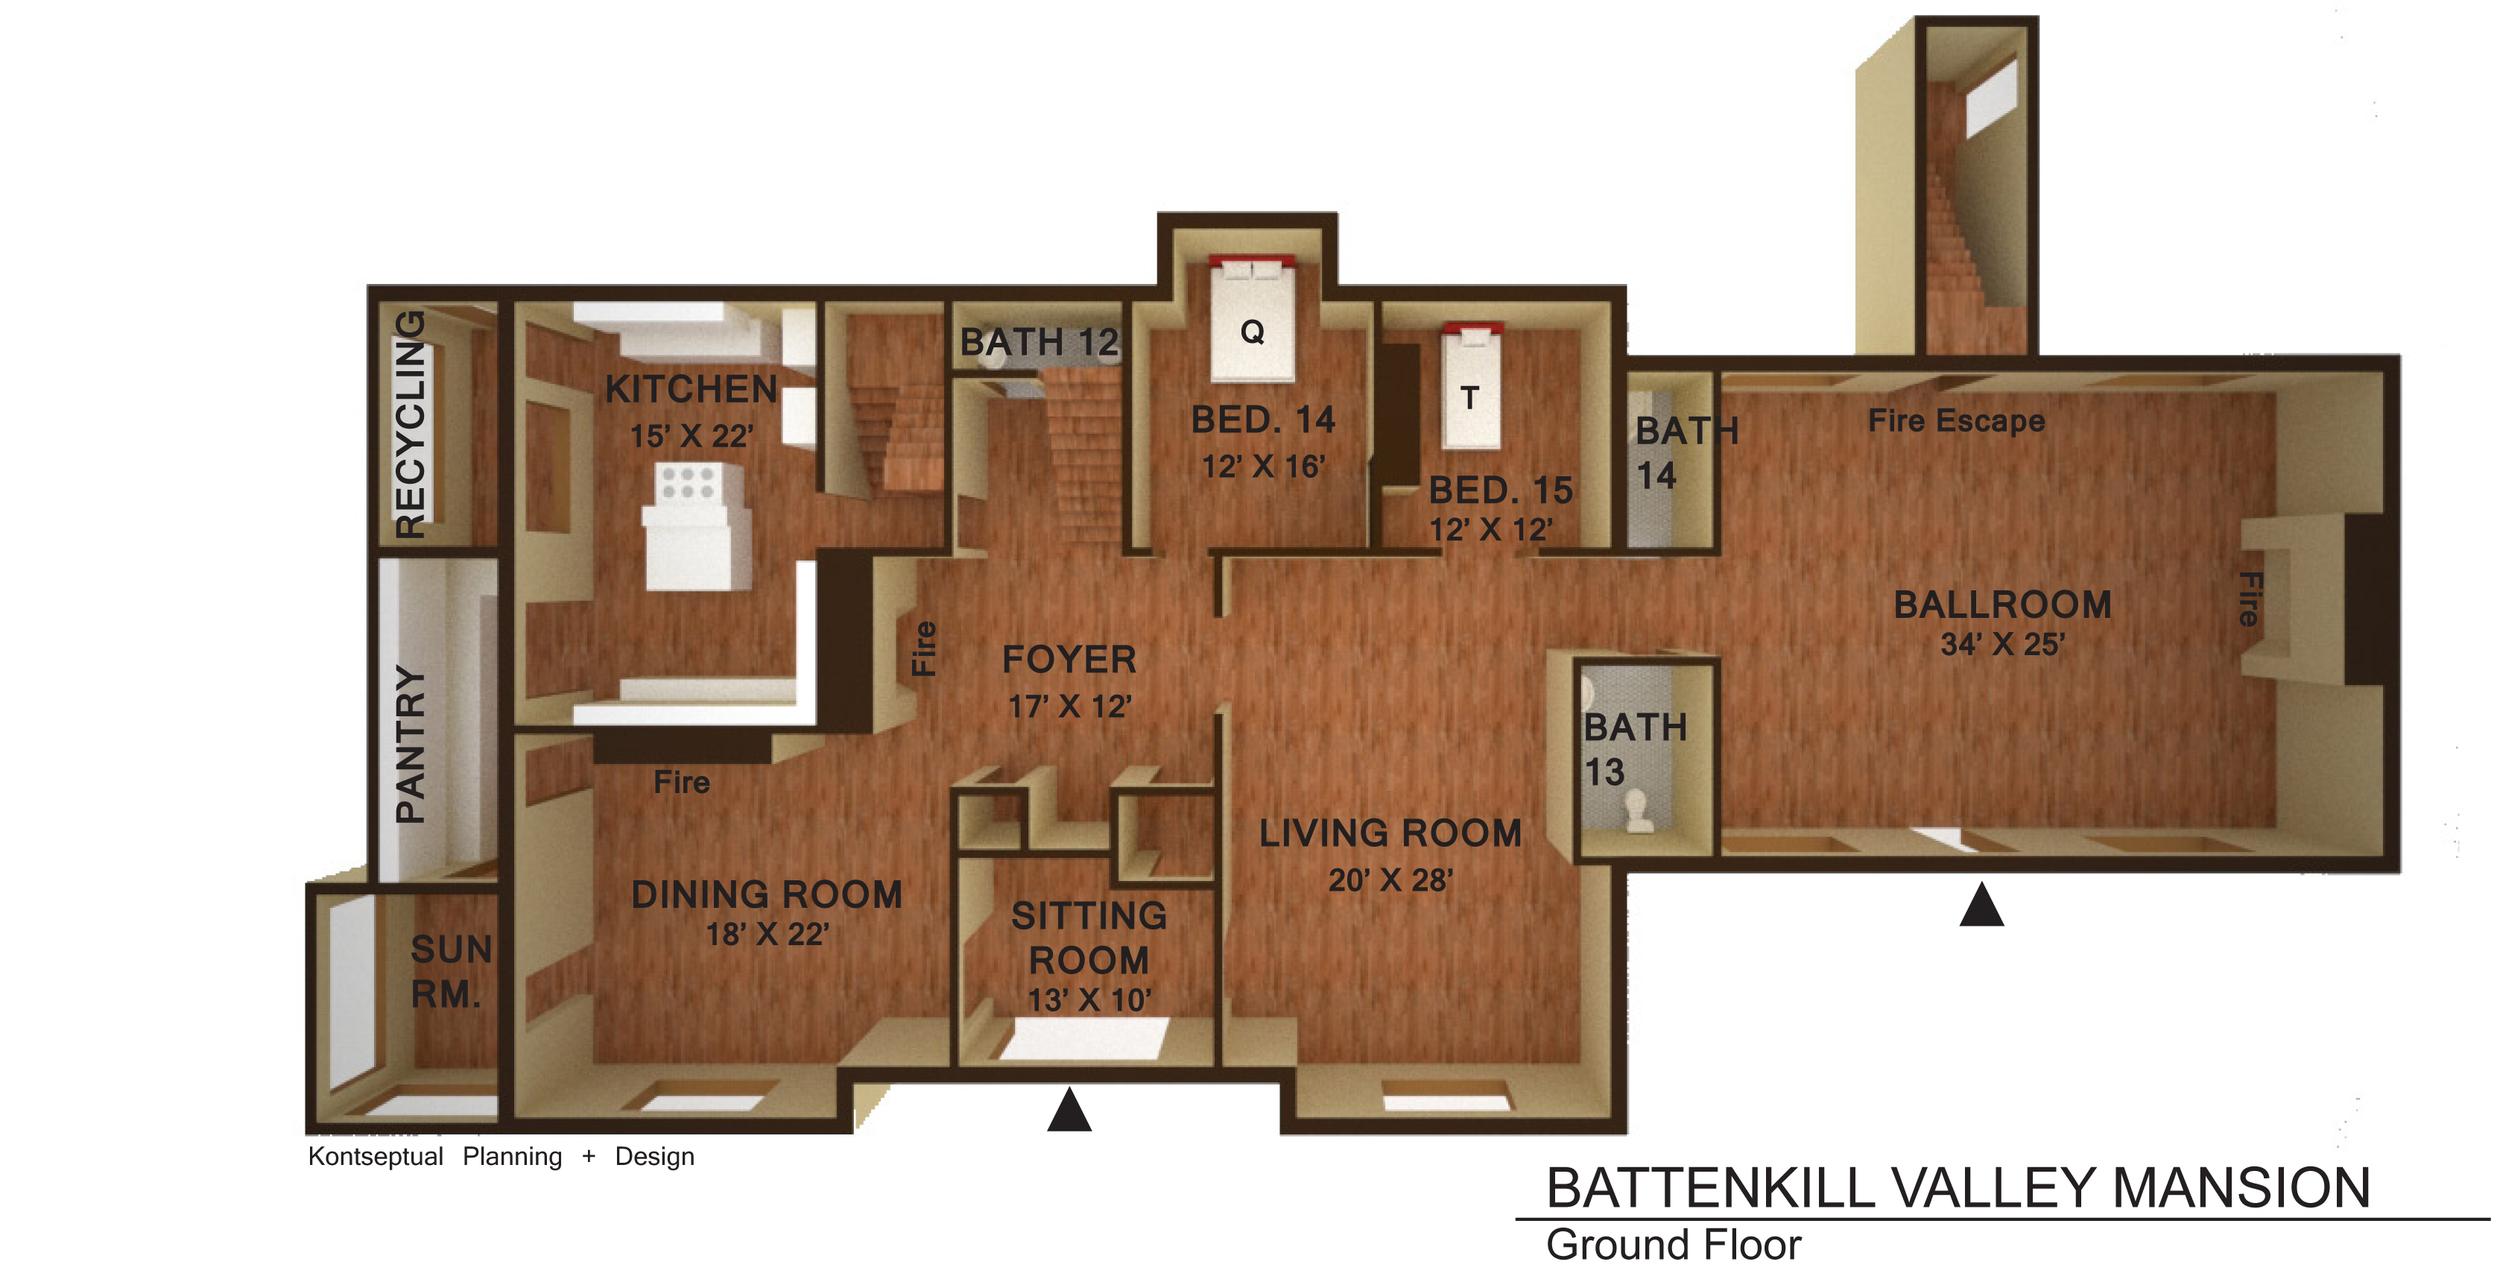 Battenkill+-+Ground+Floor.jpg